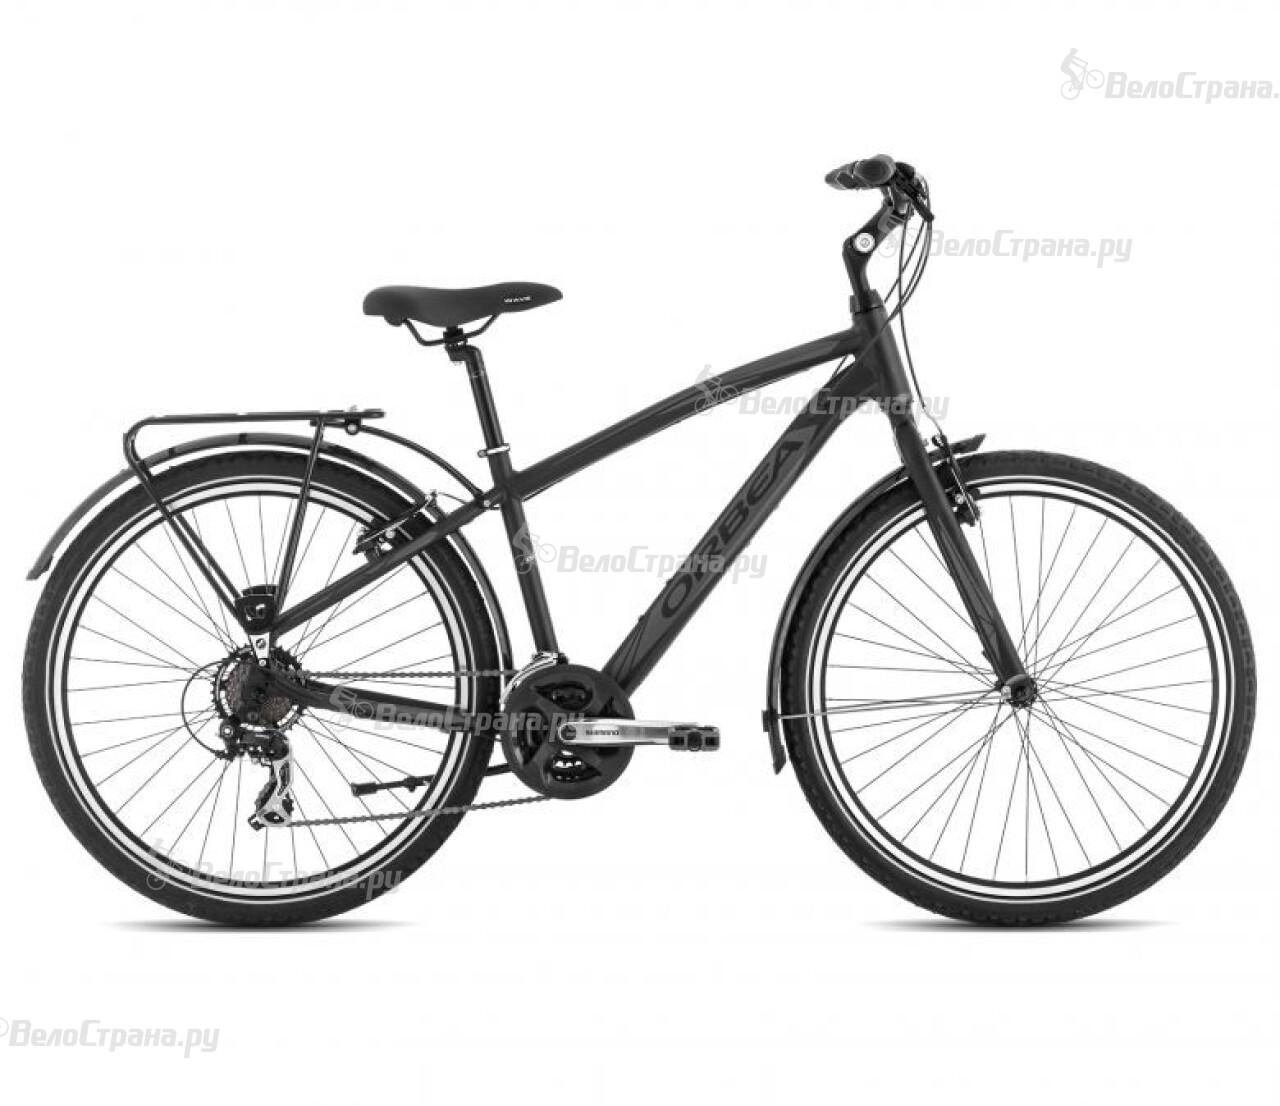 Велосипед Orbea Comfort 26 30 Equipped (2014) comfort 30